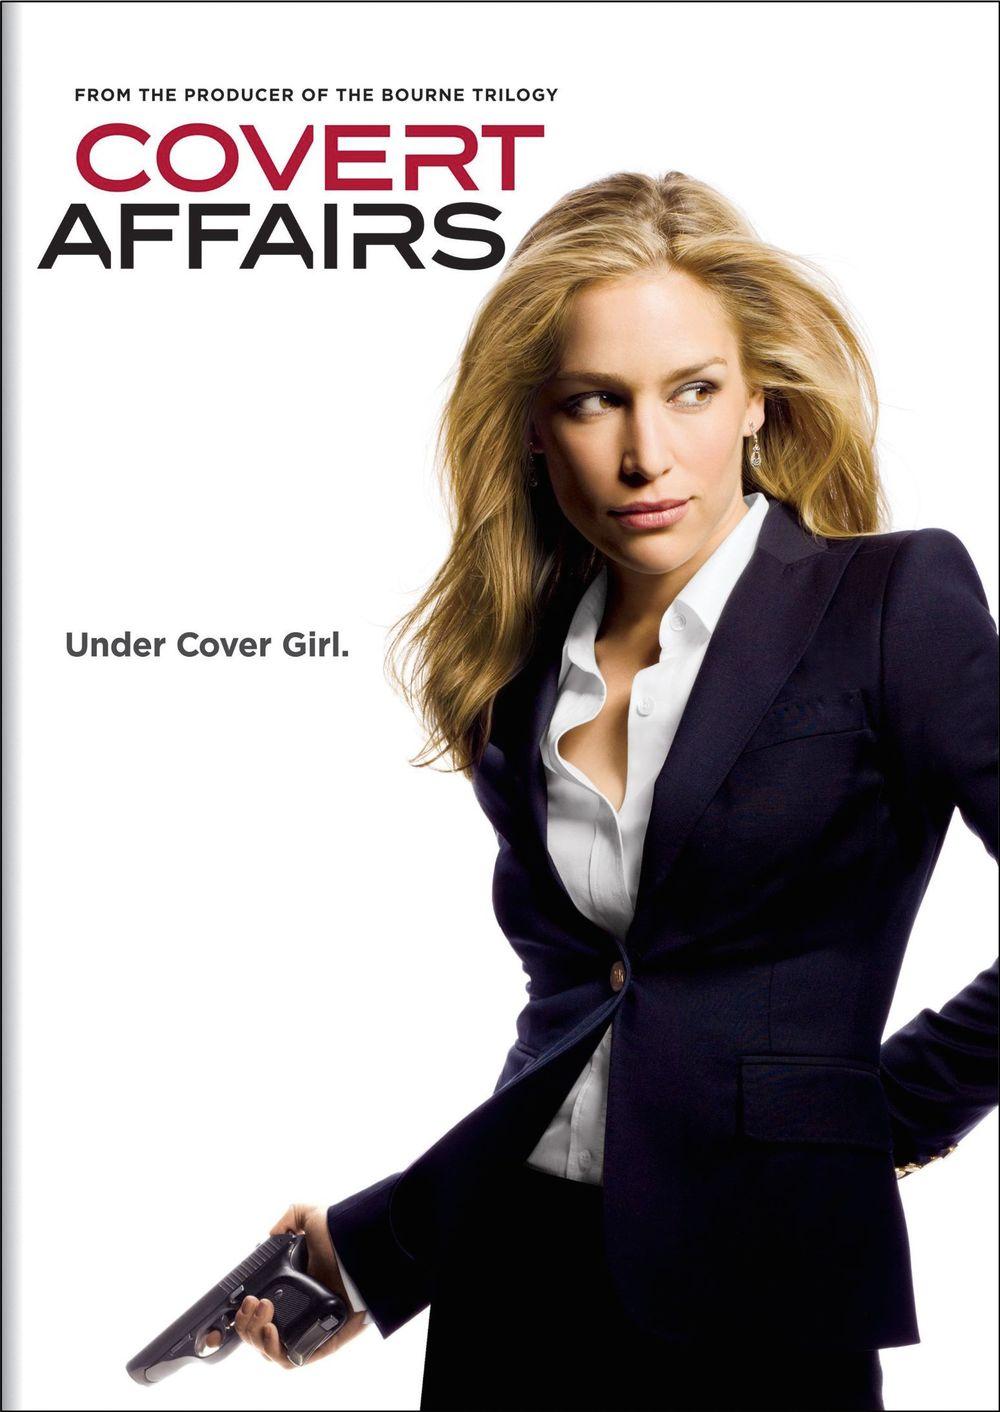 covert-affairs-cover-18.jpg